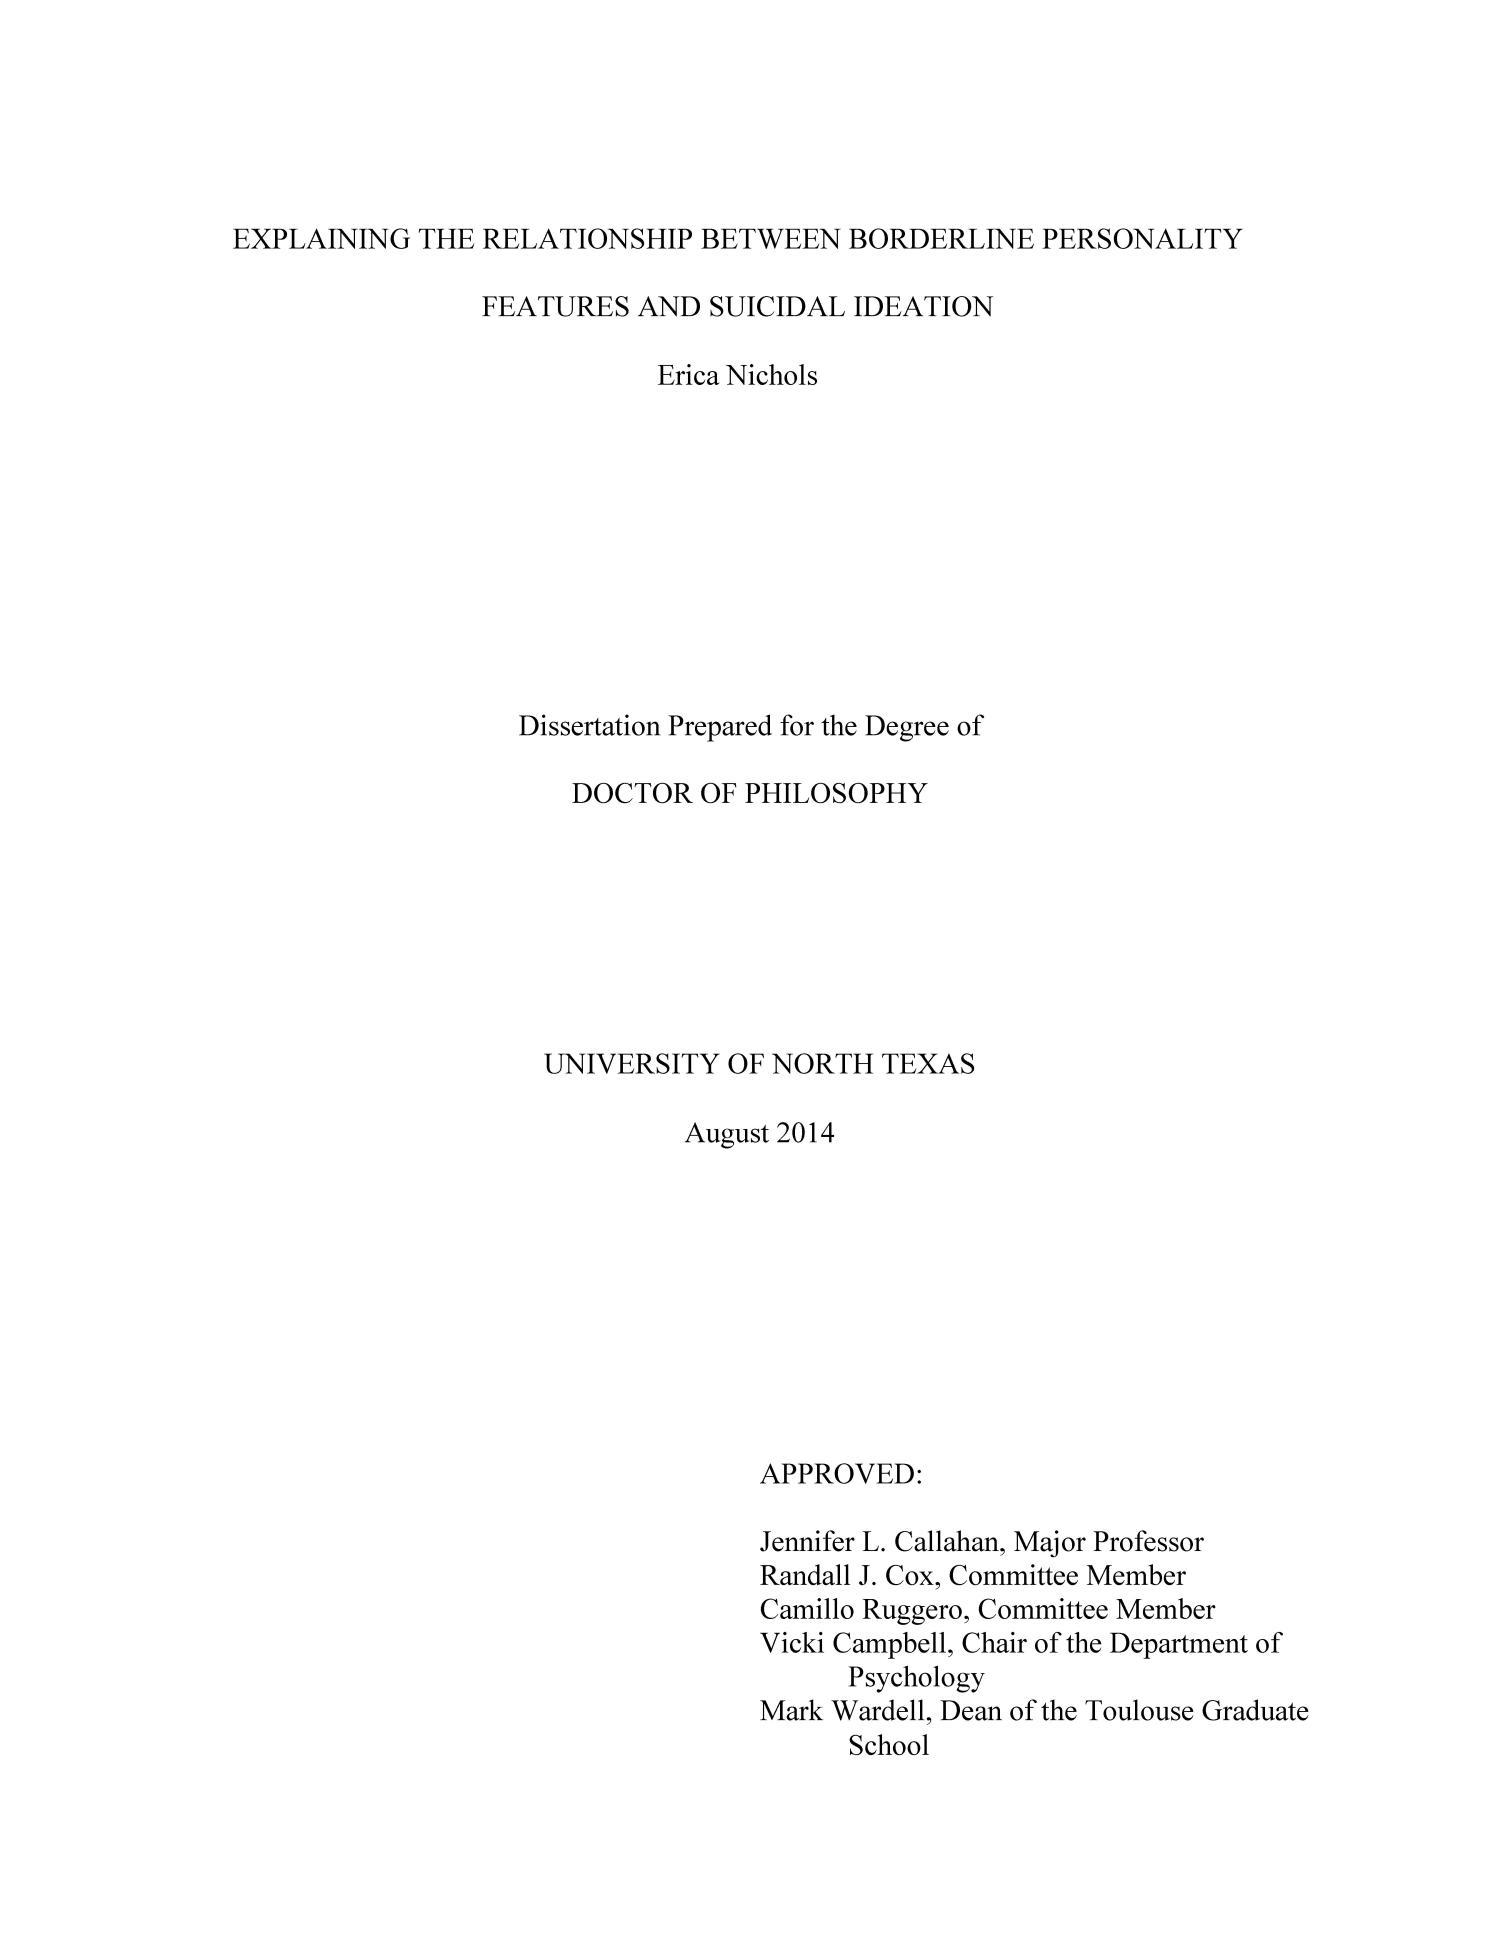 Dissertation avoidance syndrome